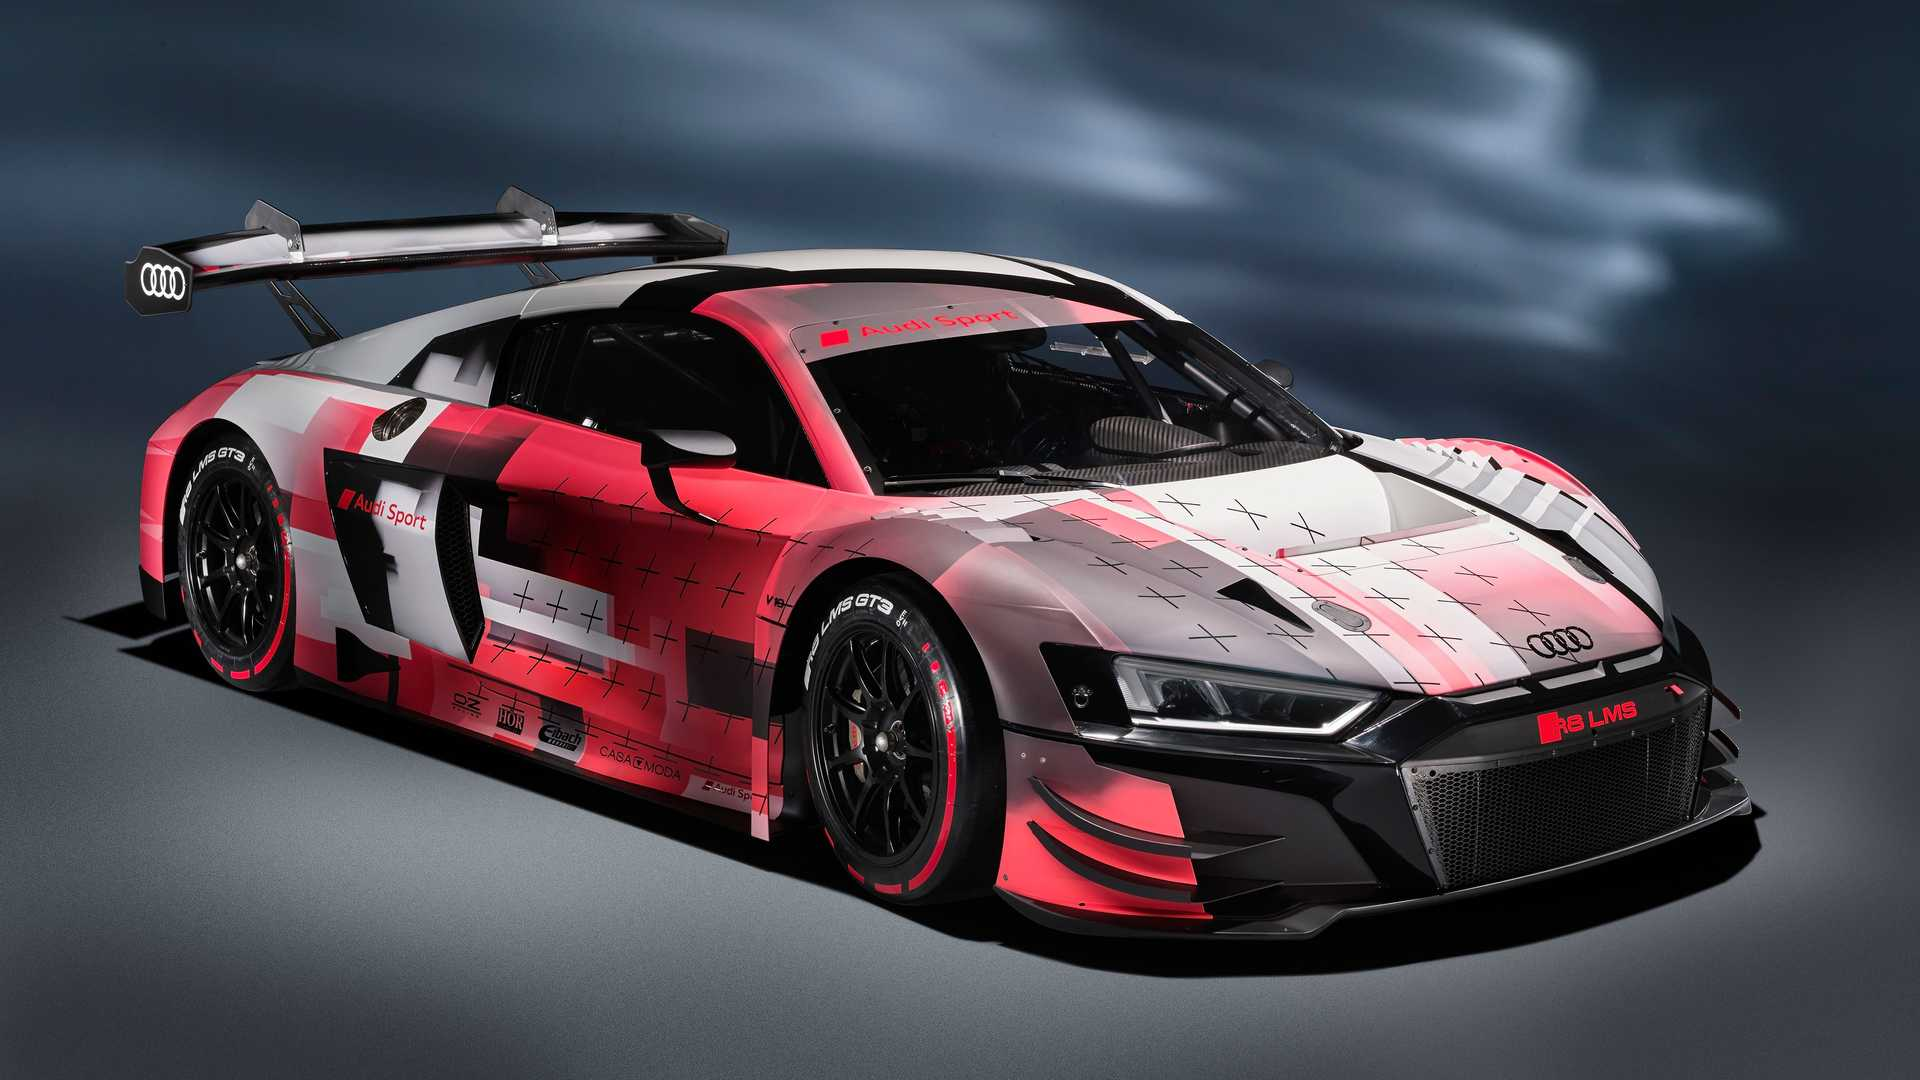 2022 Audi R8 LMS GT3 Evo II